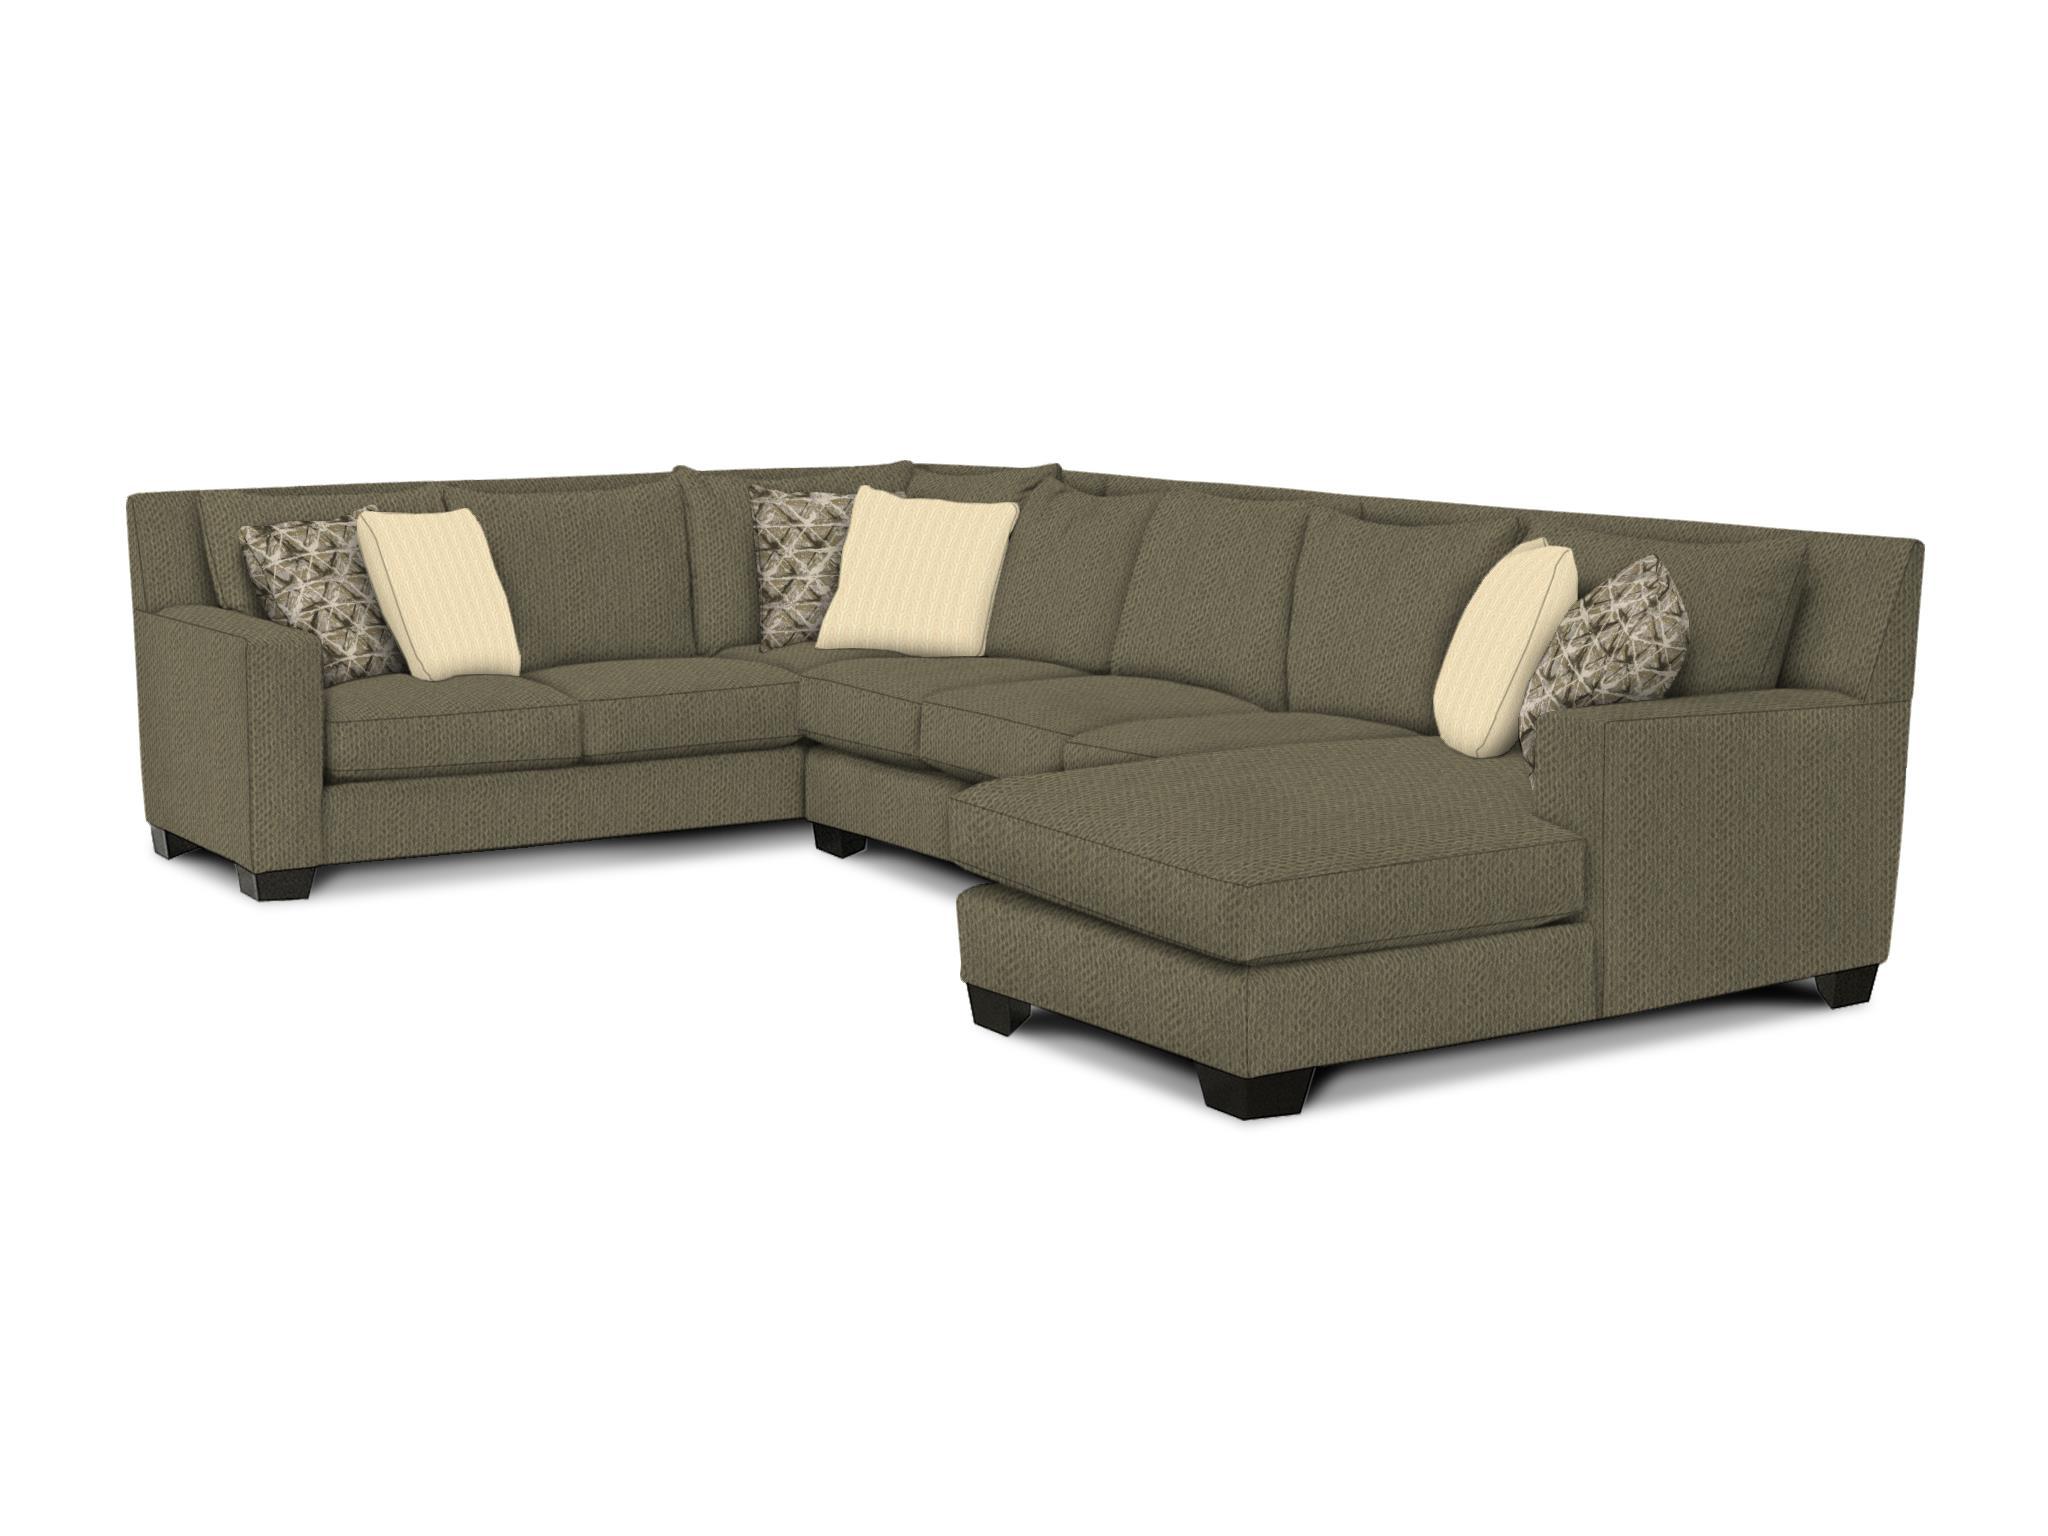 2 Piece Sectionals W/LAF Corner Sofa